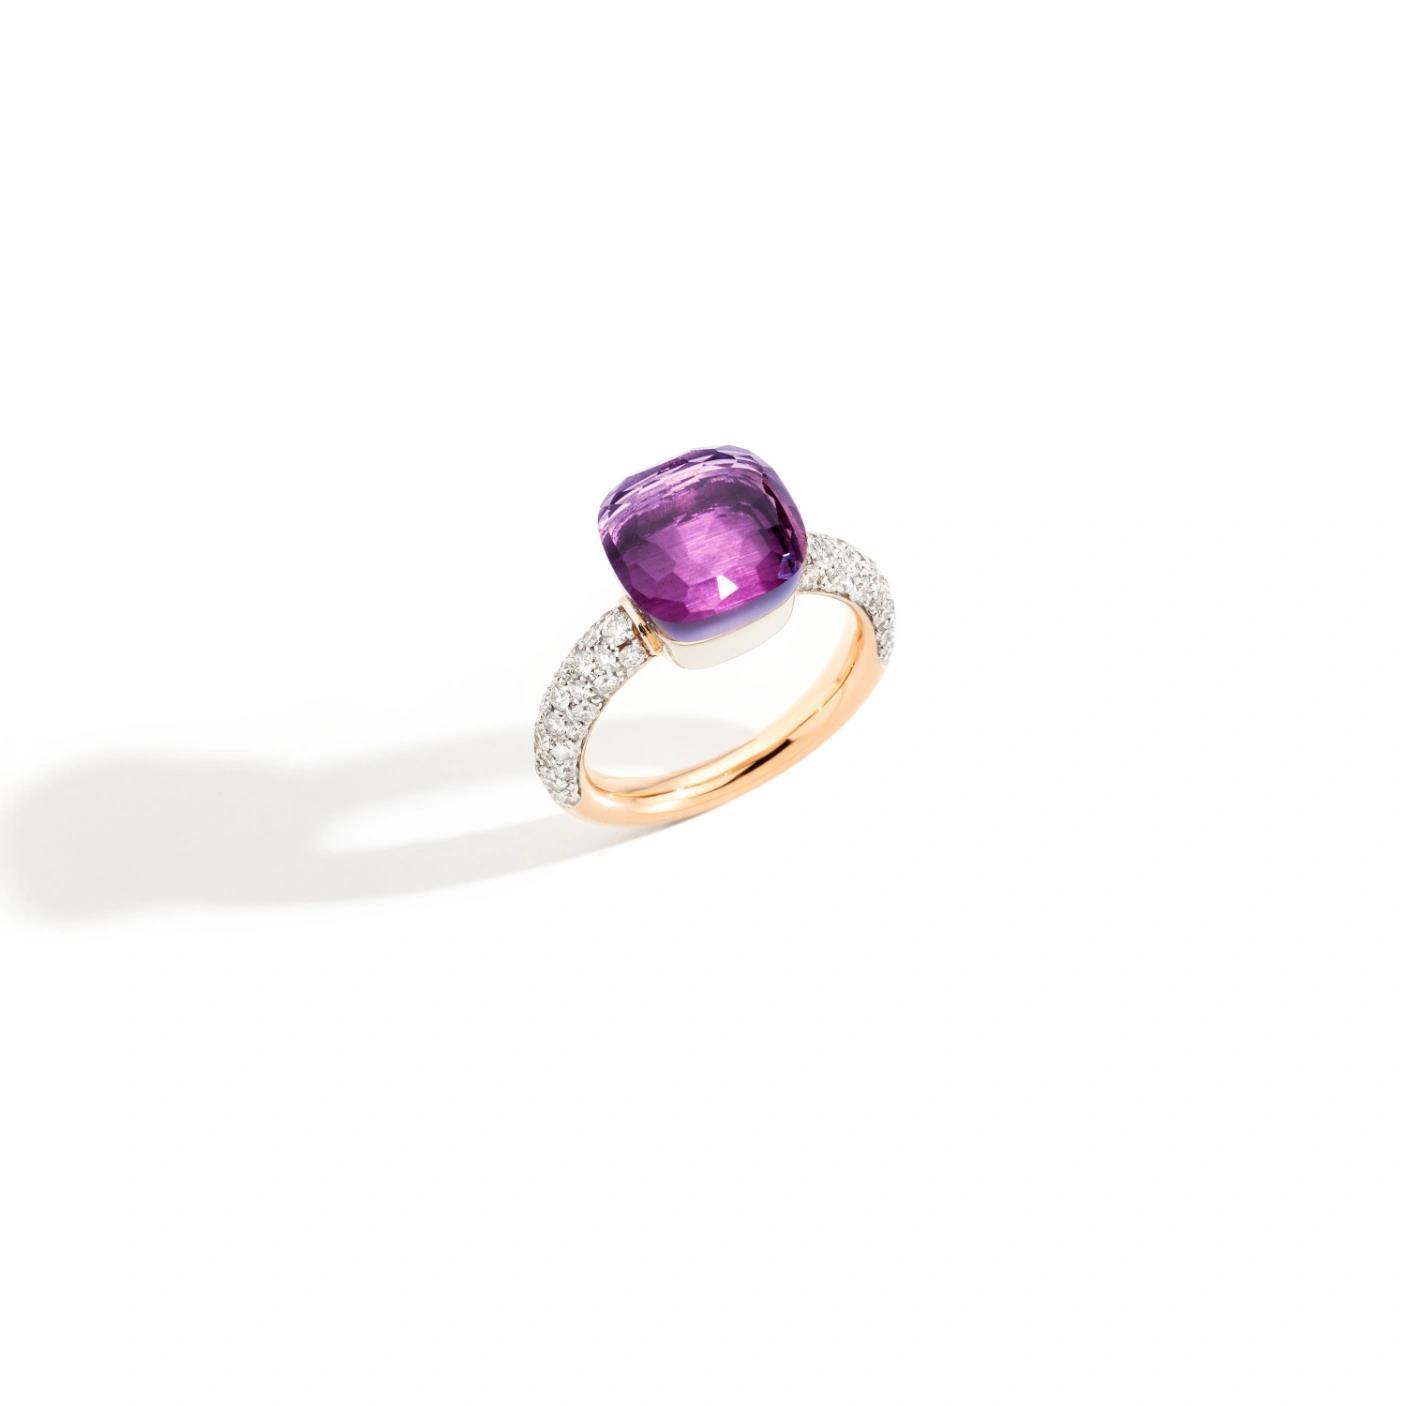 Ring Nudo Classic Amethyst - Pomellato - PAC0040O6WHRDB0OI